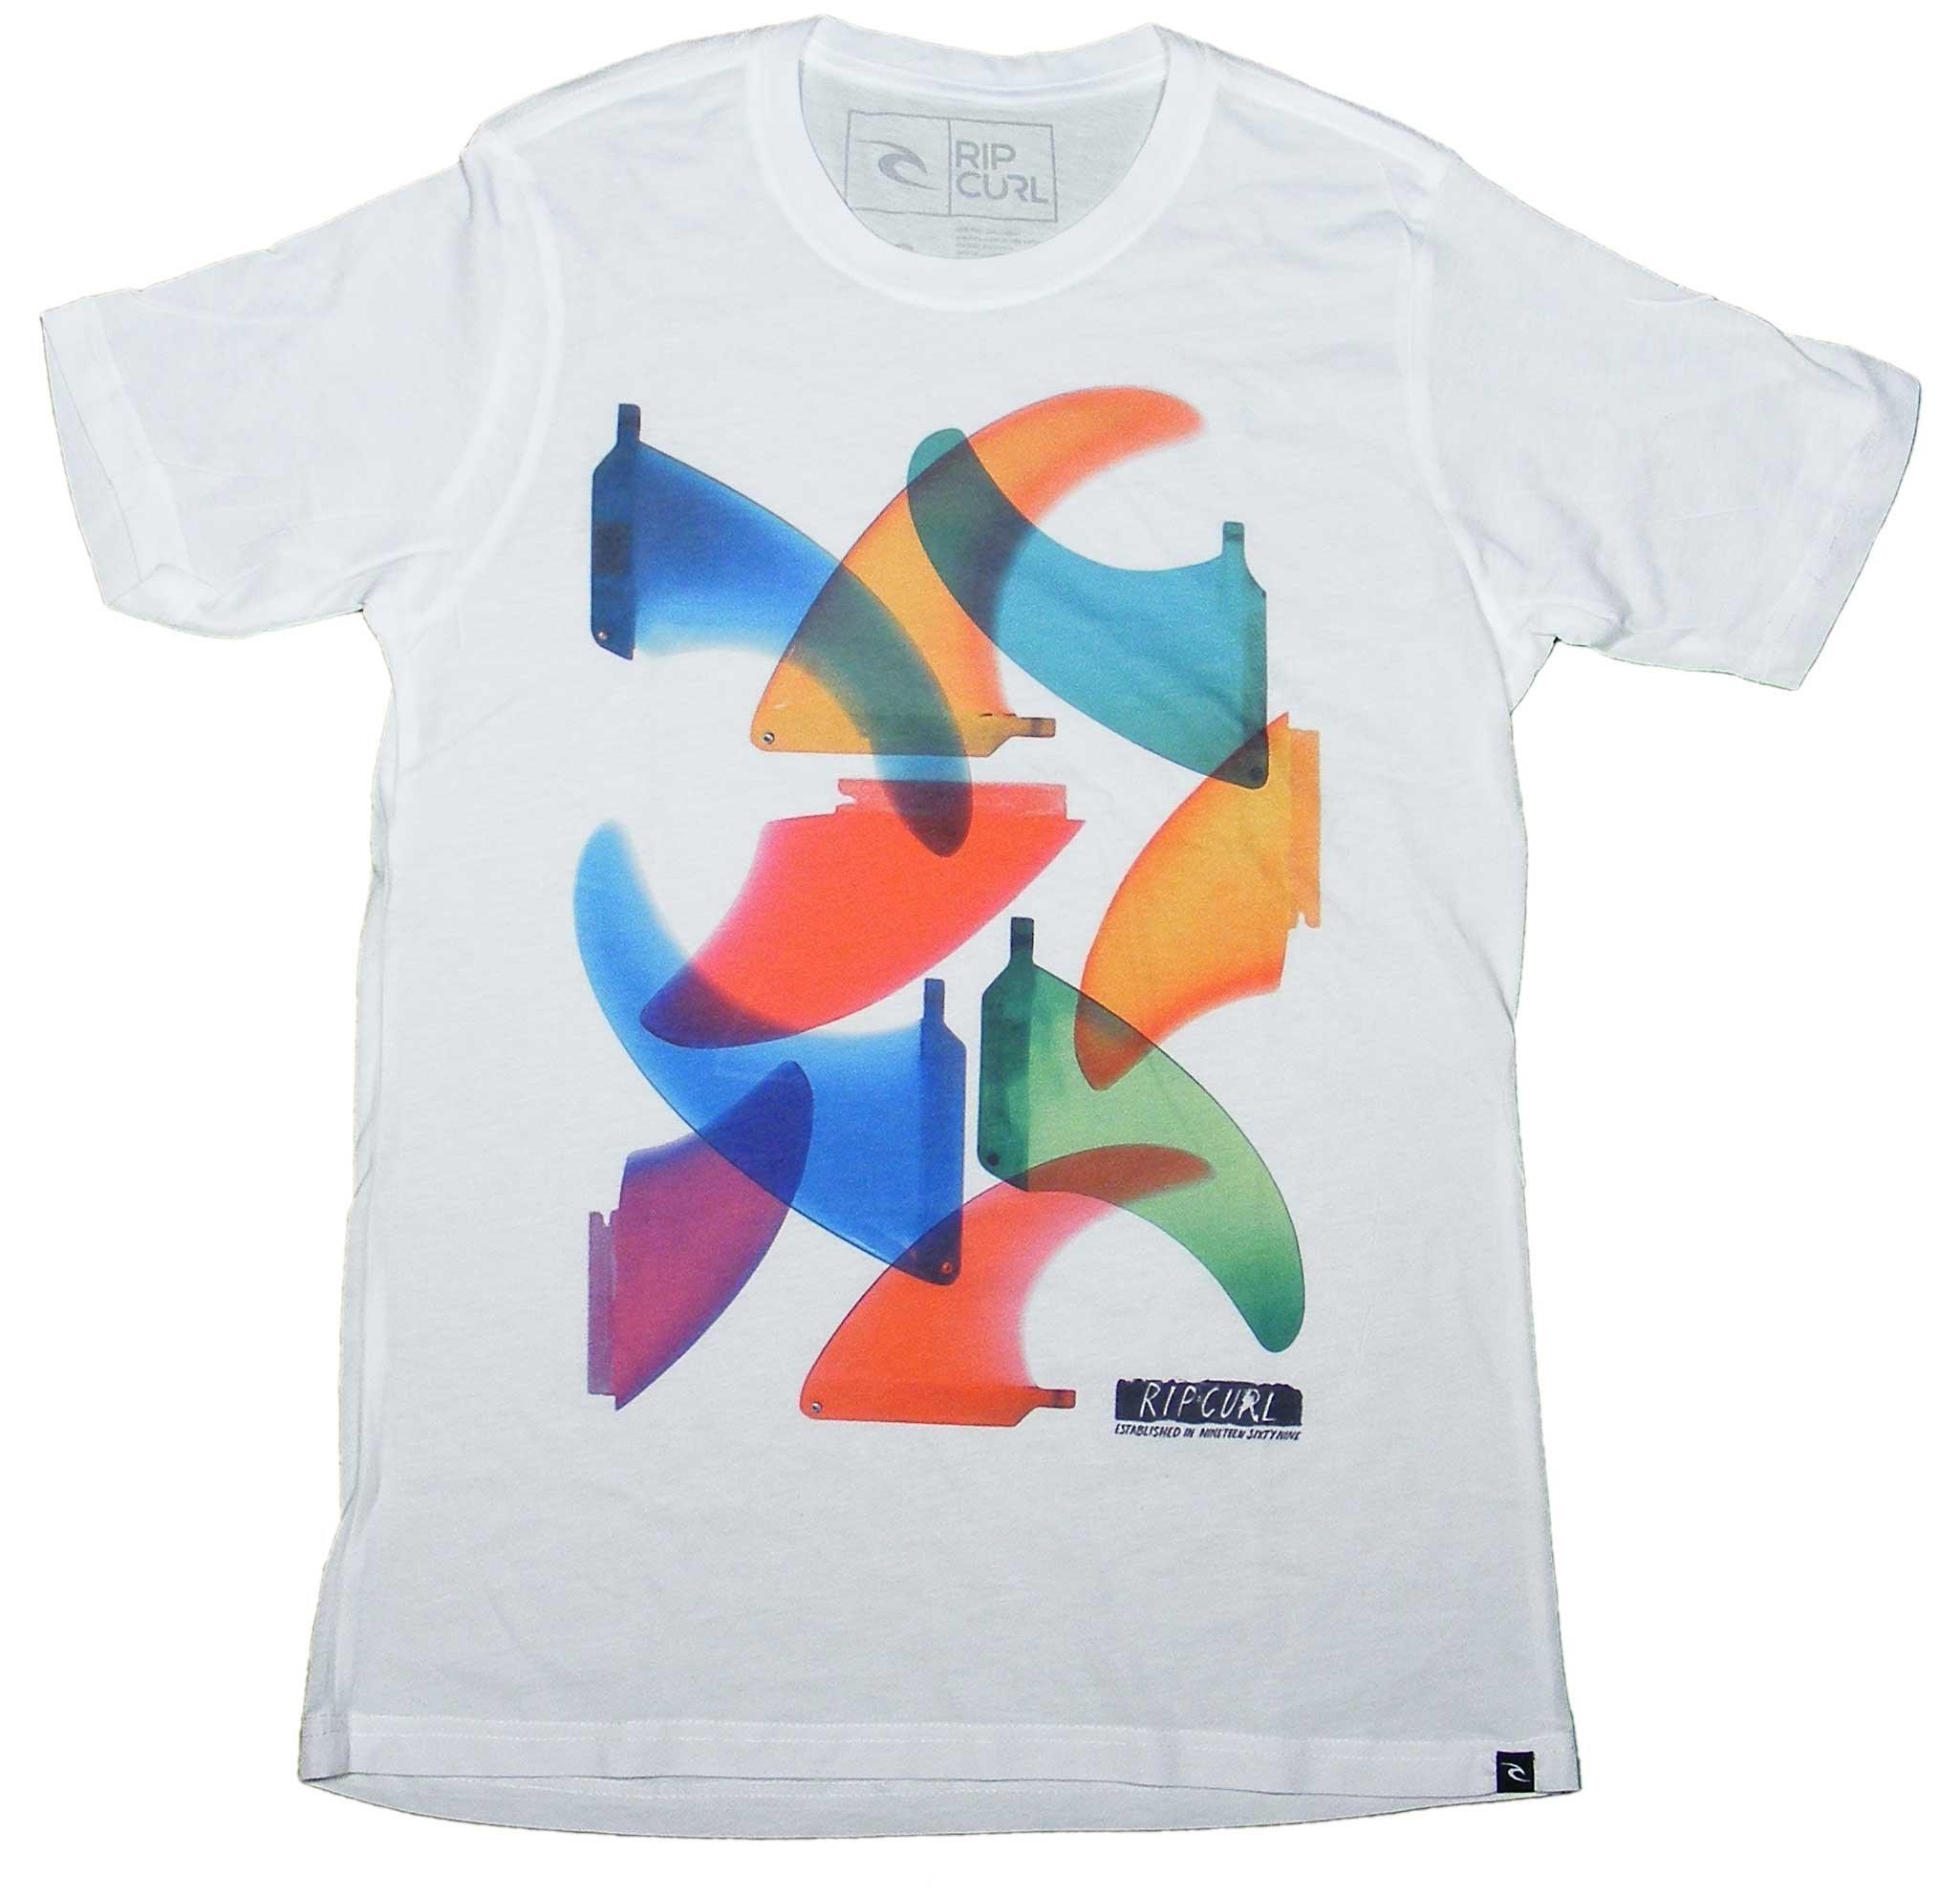 Rip Curl Fiber Glass Sublimination T-Shirt - White - XL